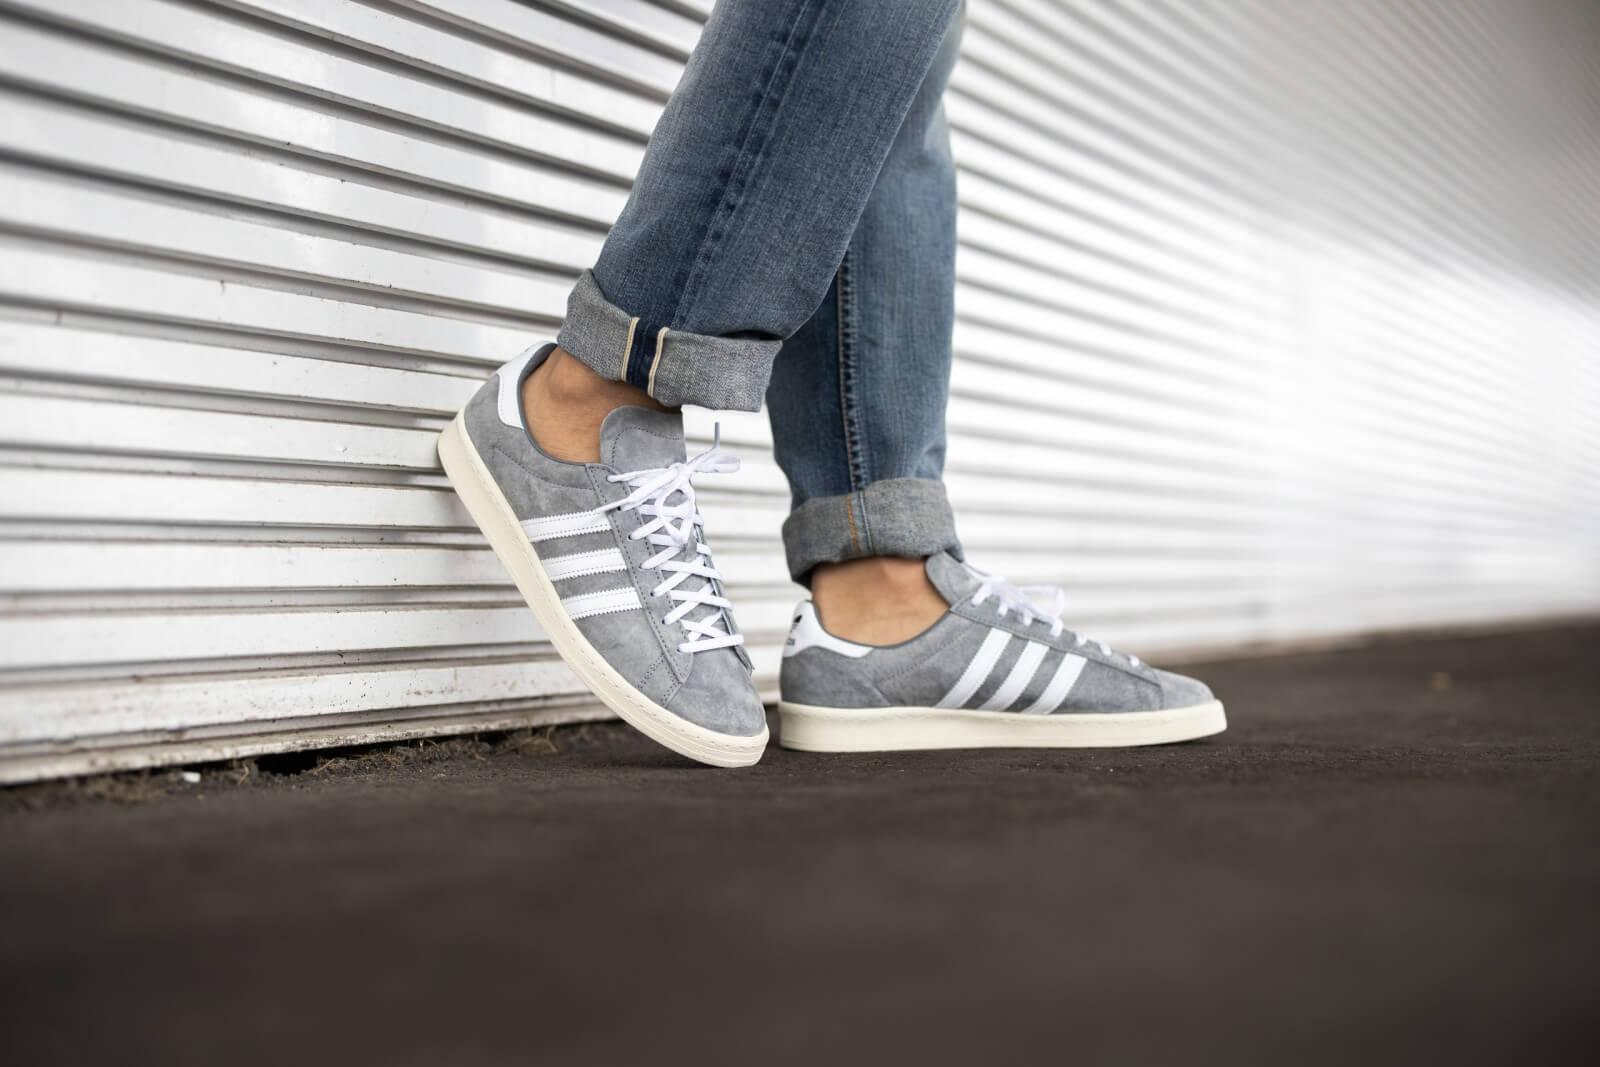 Adidas Campus 80s Grey/Footwear White-Off White